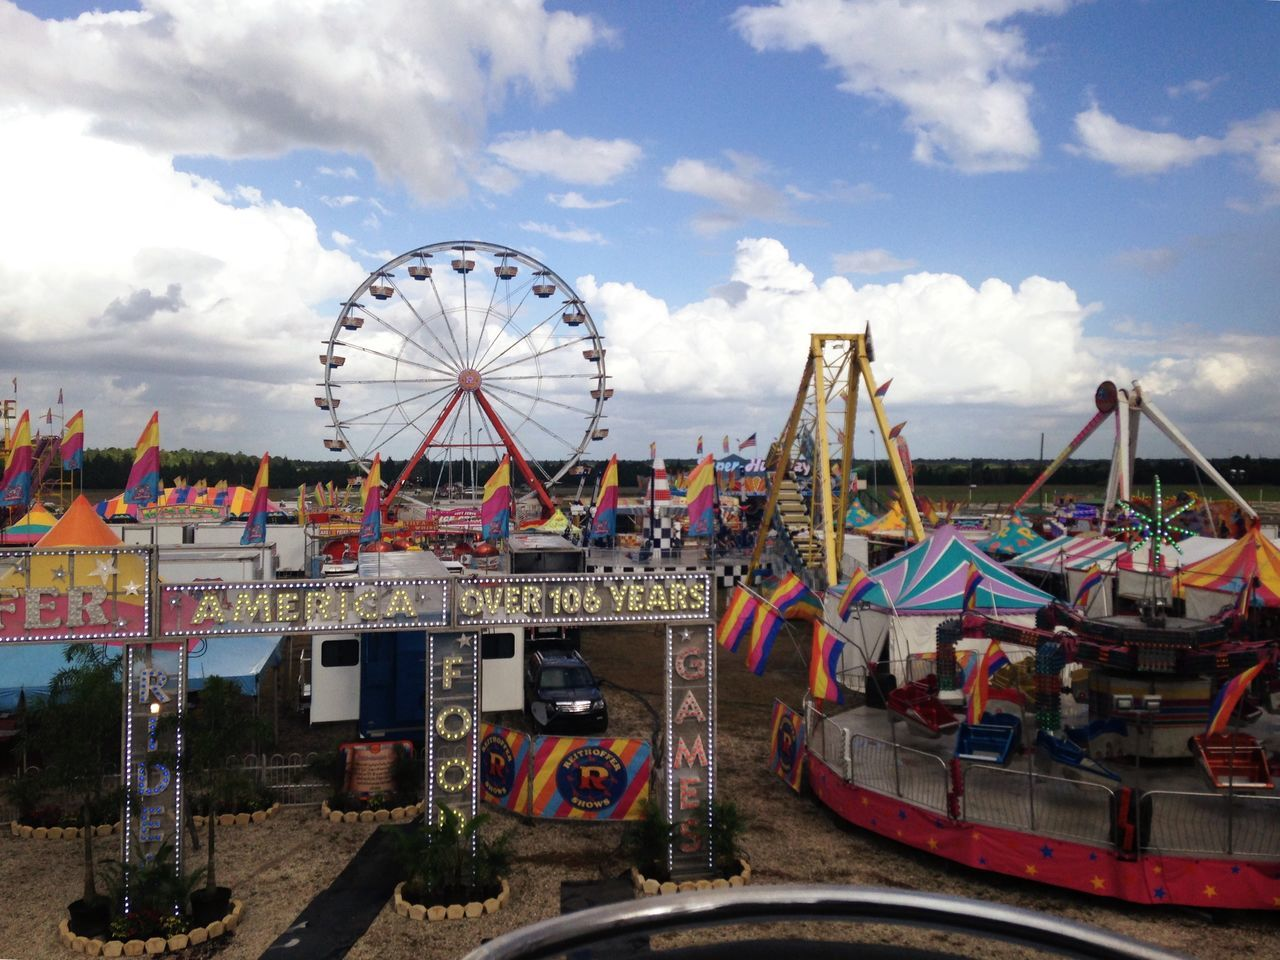 amusement park, arts culture and entertainment, cloud - sky, sky, ferris wheel, amusement park ride, day, outdoors, no people, carousel